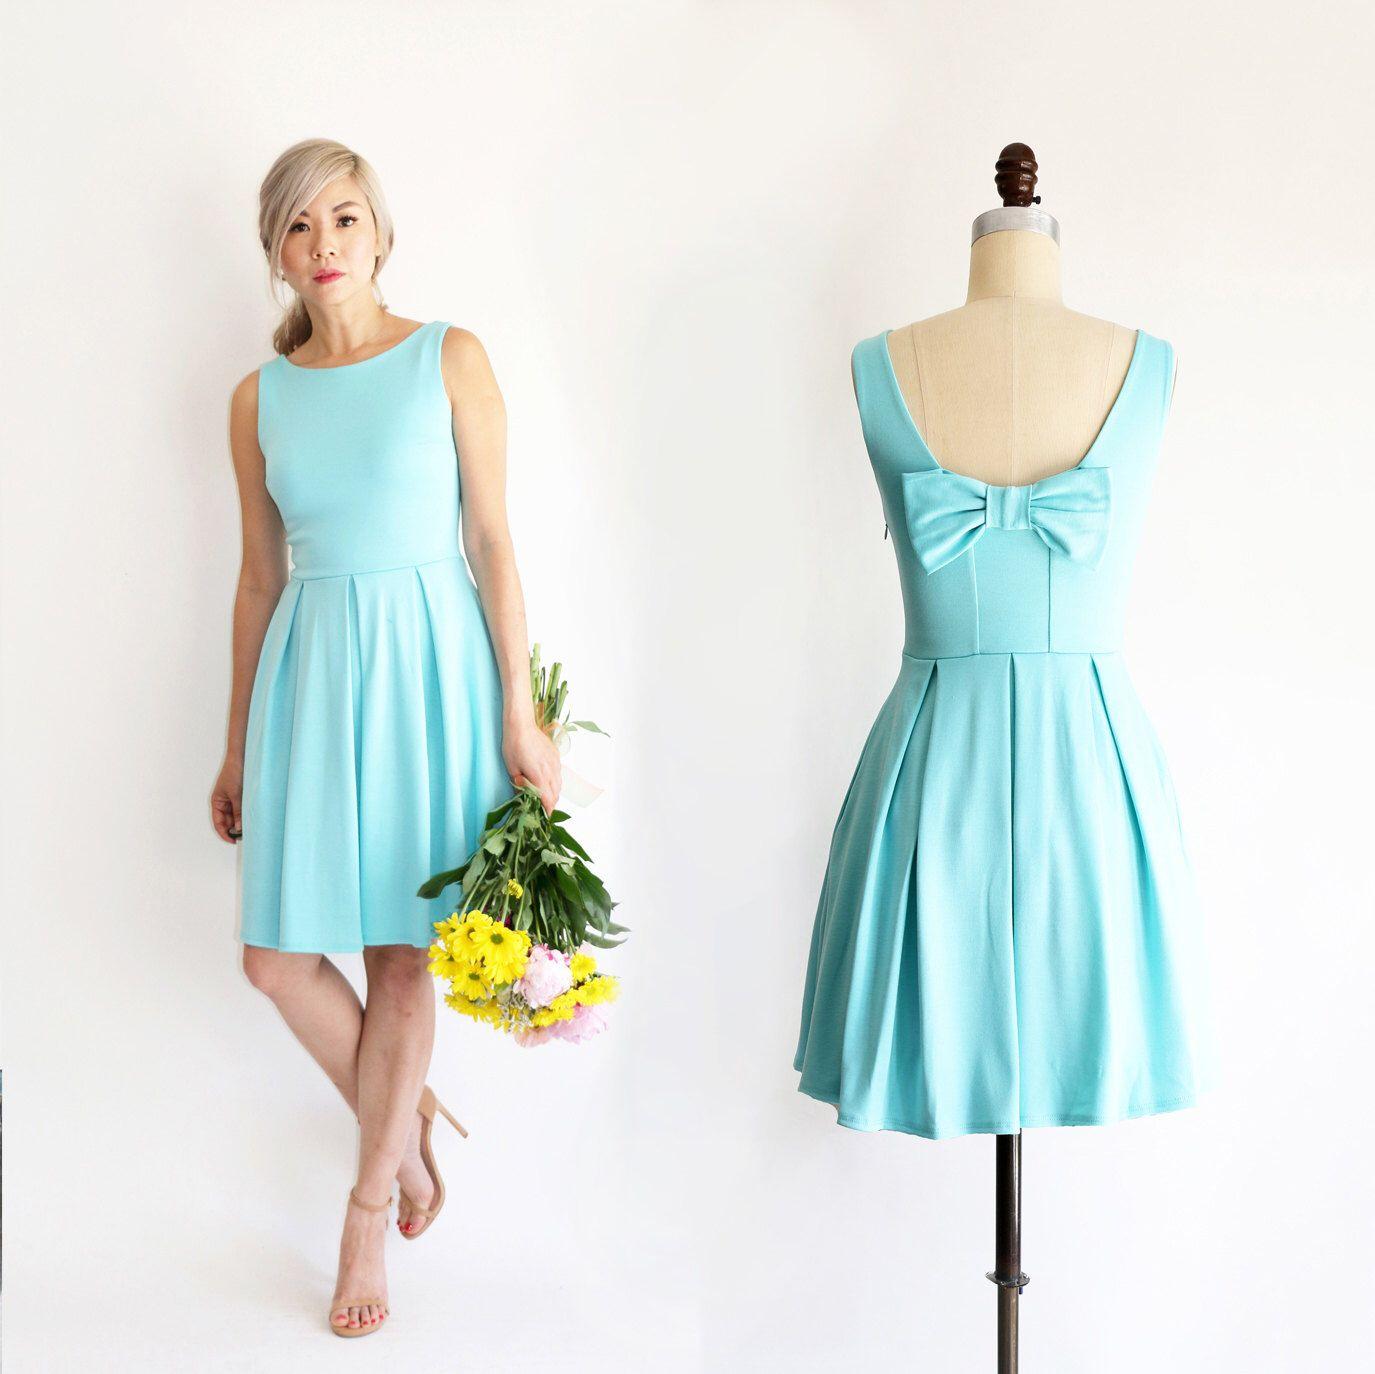 JANUARY | Aqua - Light seafoam teal bridesmaid dress with back bow ...